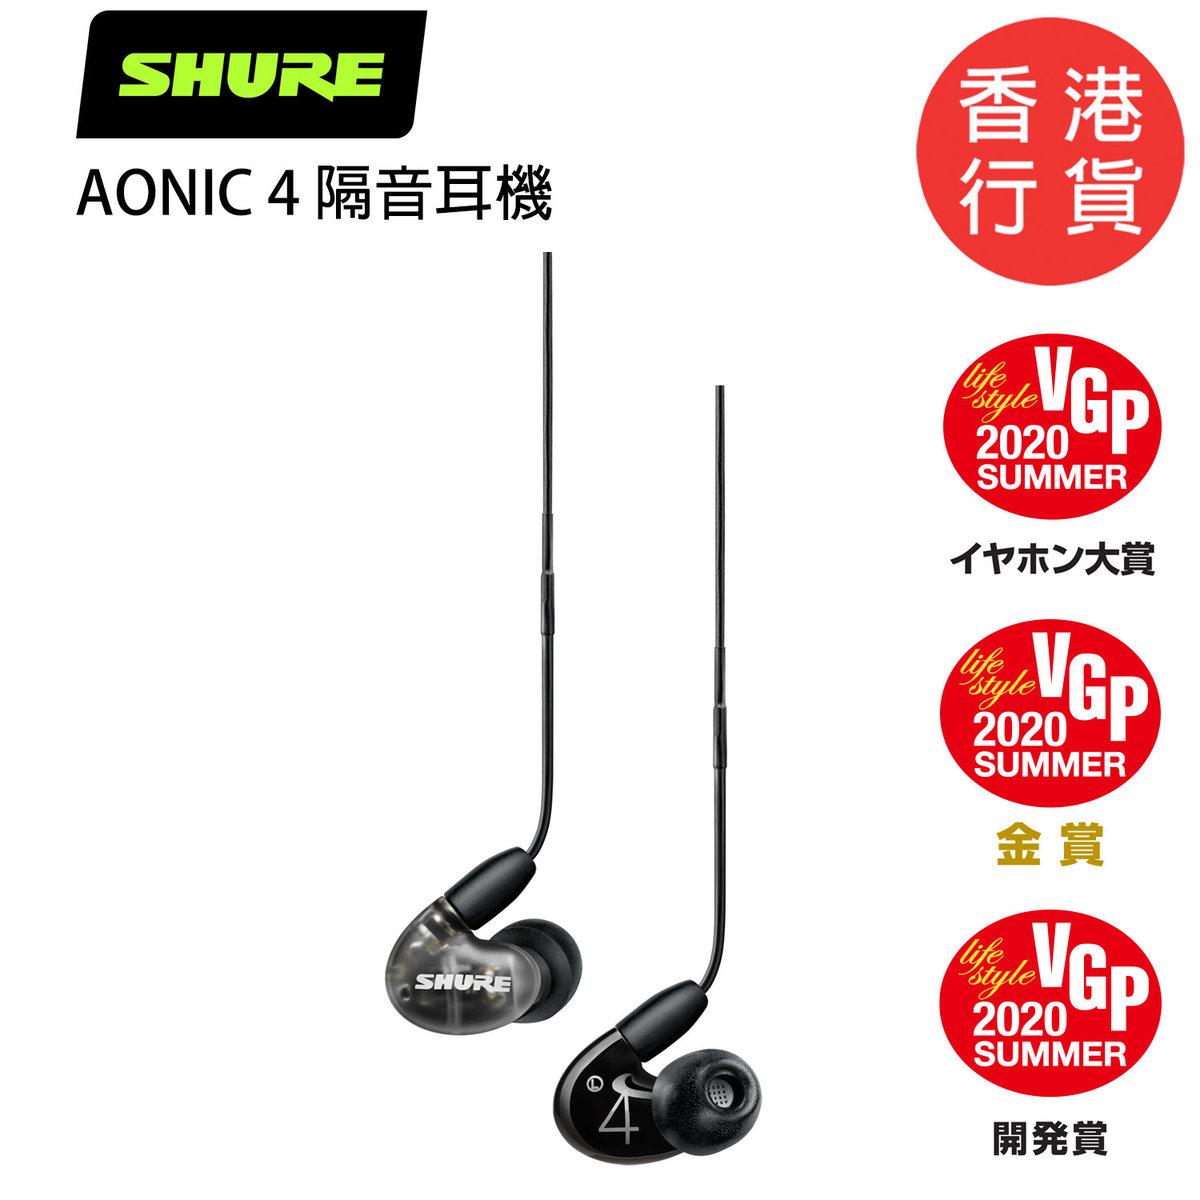 AONIC 4 Sound Isolating Earphones - Black